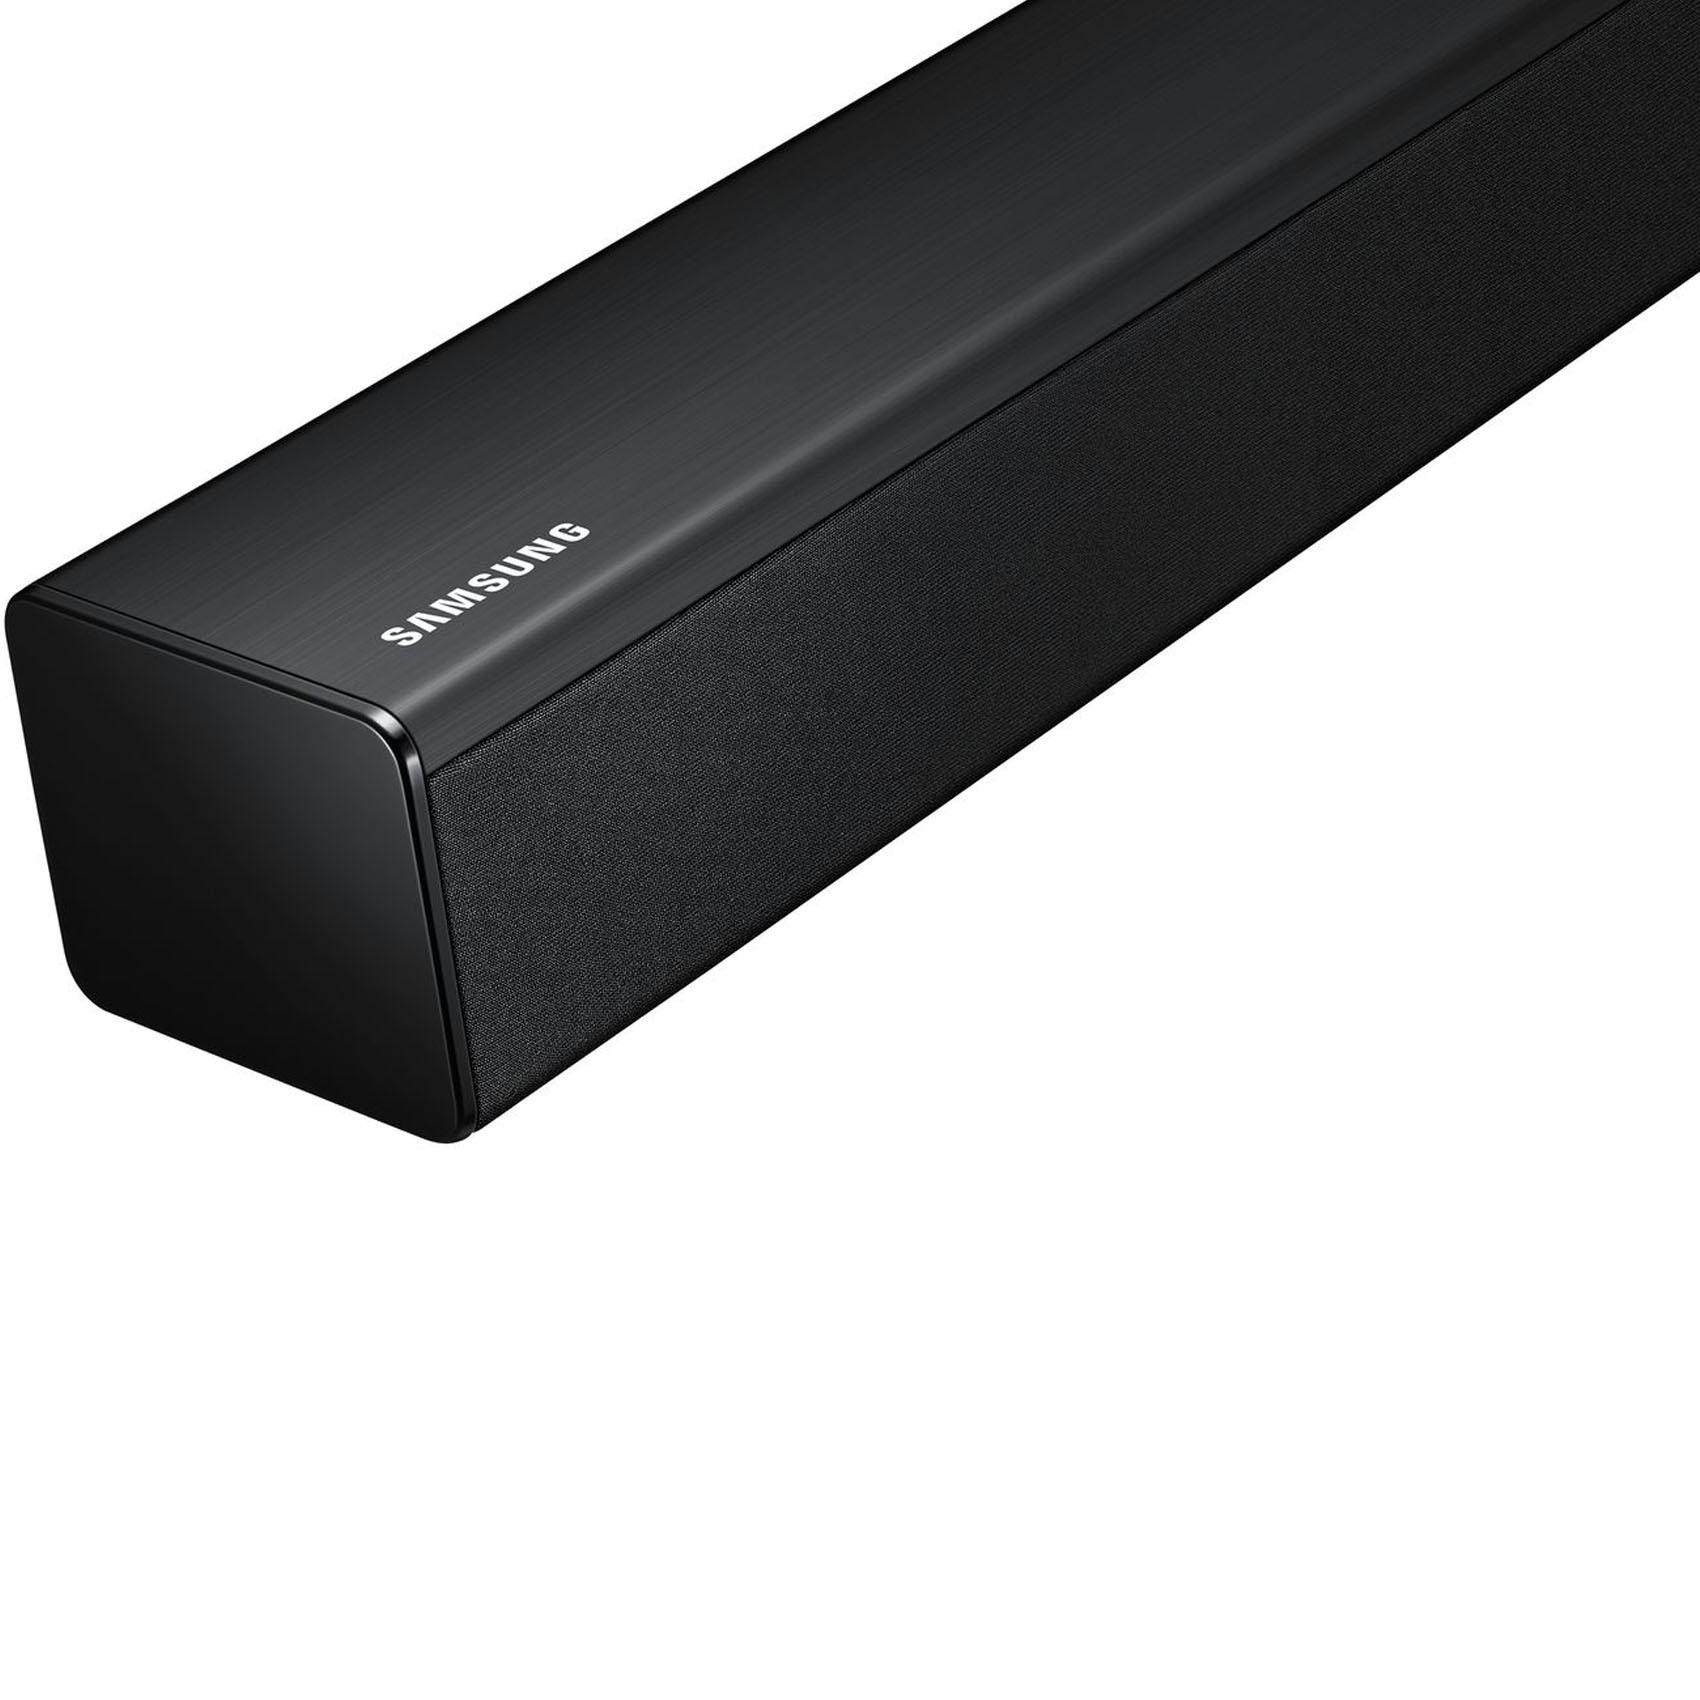 SAMSUNG SOUNDBAR HW-J250 2.2CH